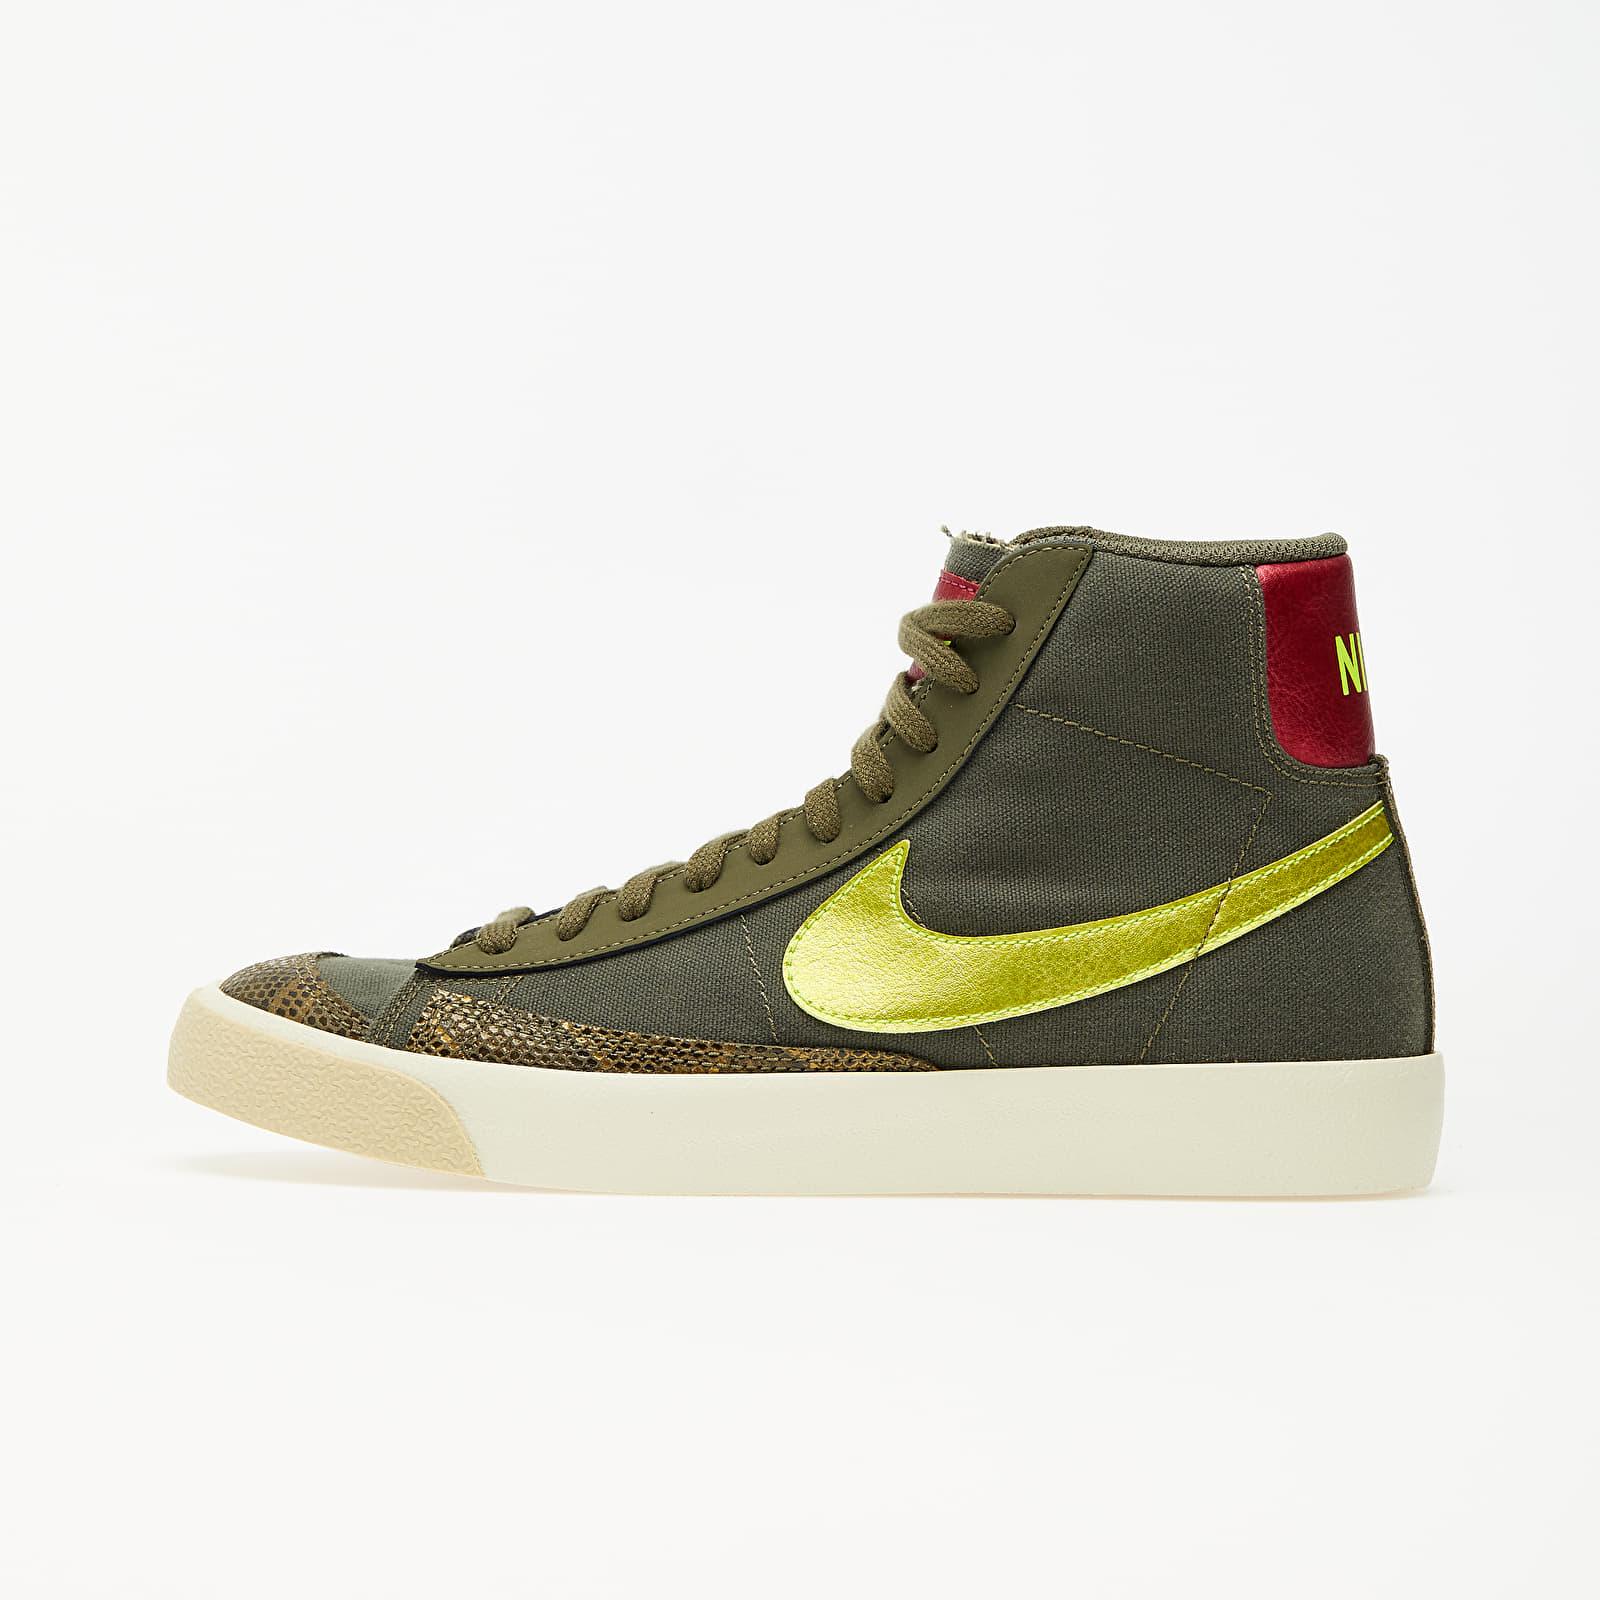 Dámské tenisky a boty Nike Wmns Blazer Mid '77 Medium Olive/ Lemon Venom-Fossil